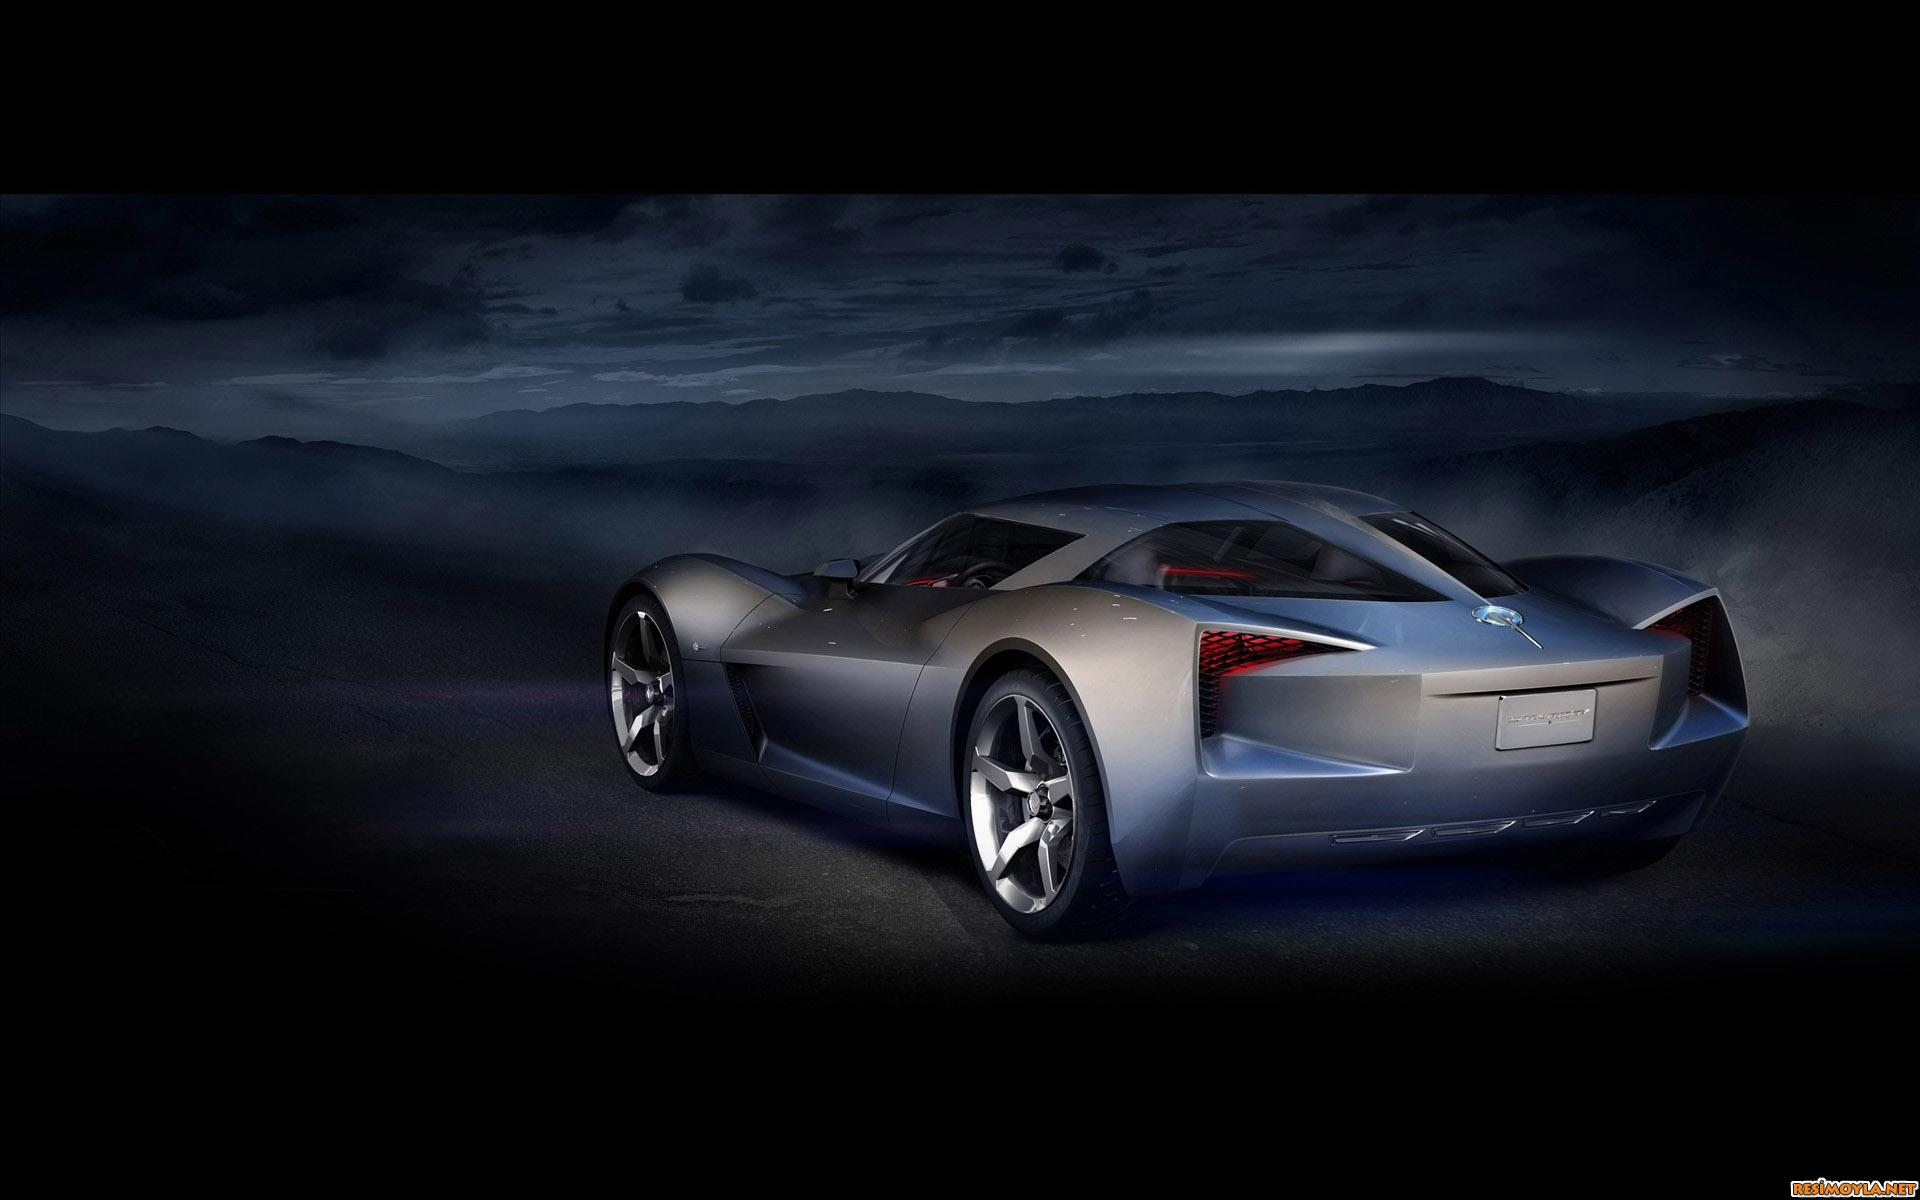 futuristic car backgrounds wallpaper